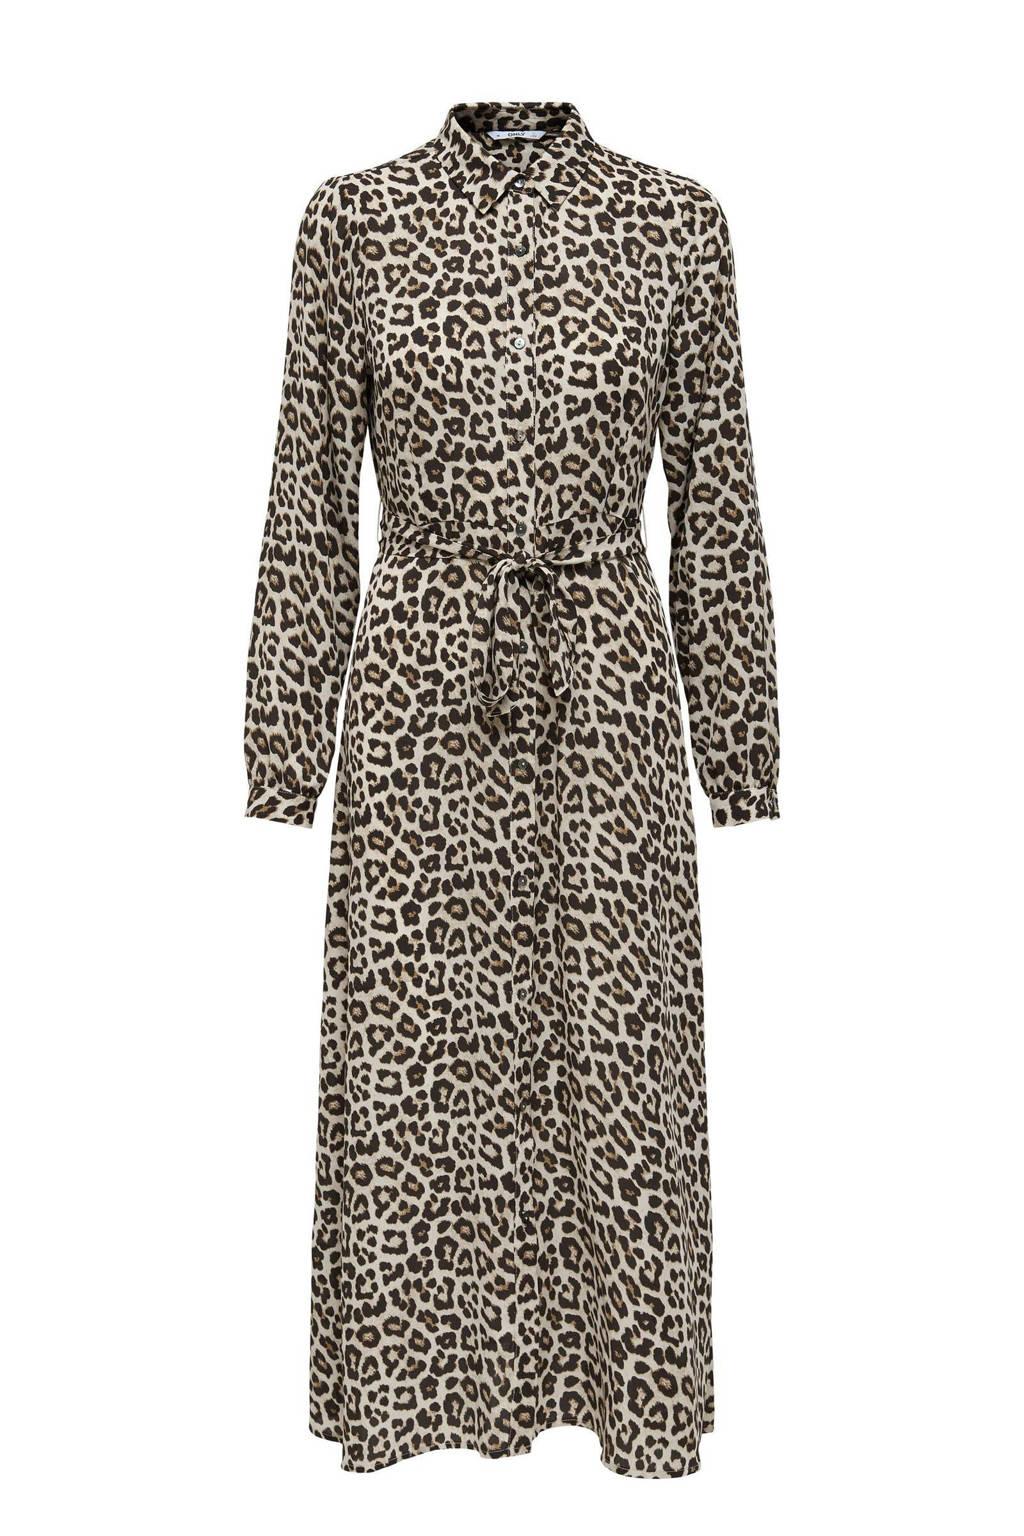 ONLY blousejurk ONLNEWALMA van gerecycled polyester beige/bruin/zwart, Beige/bruin/zwart